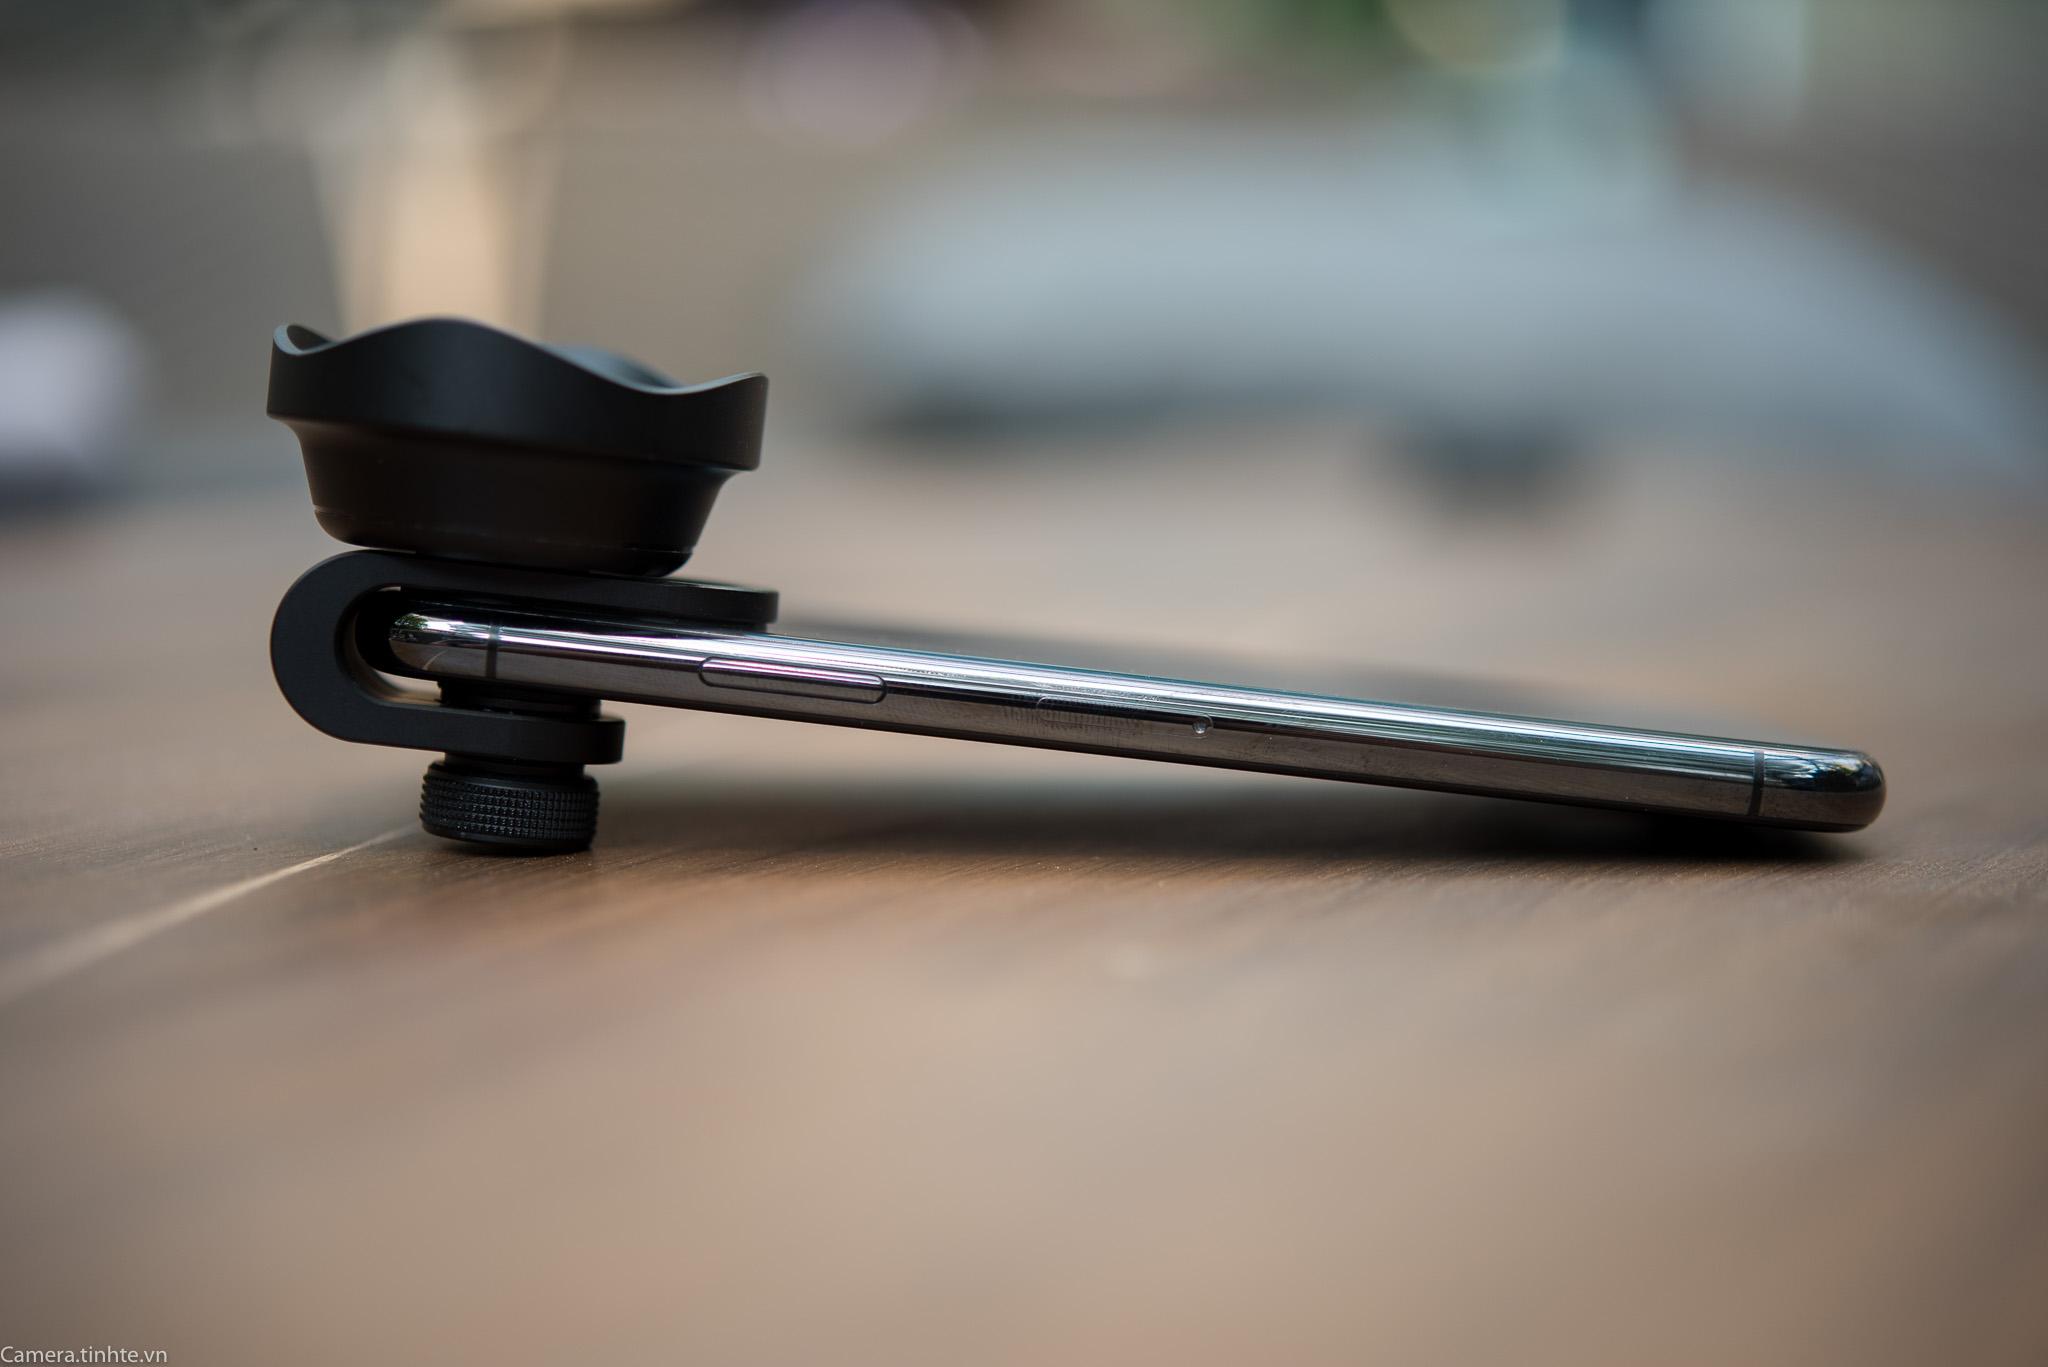 Tren tay ong kinh P-Hole lens iPhone X - Camera.tinhte.vn-18.jpg